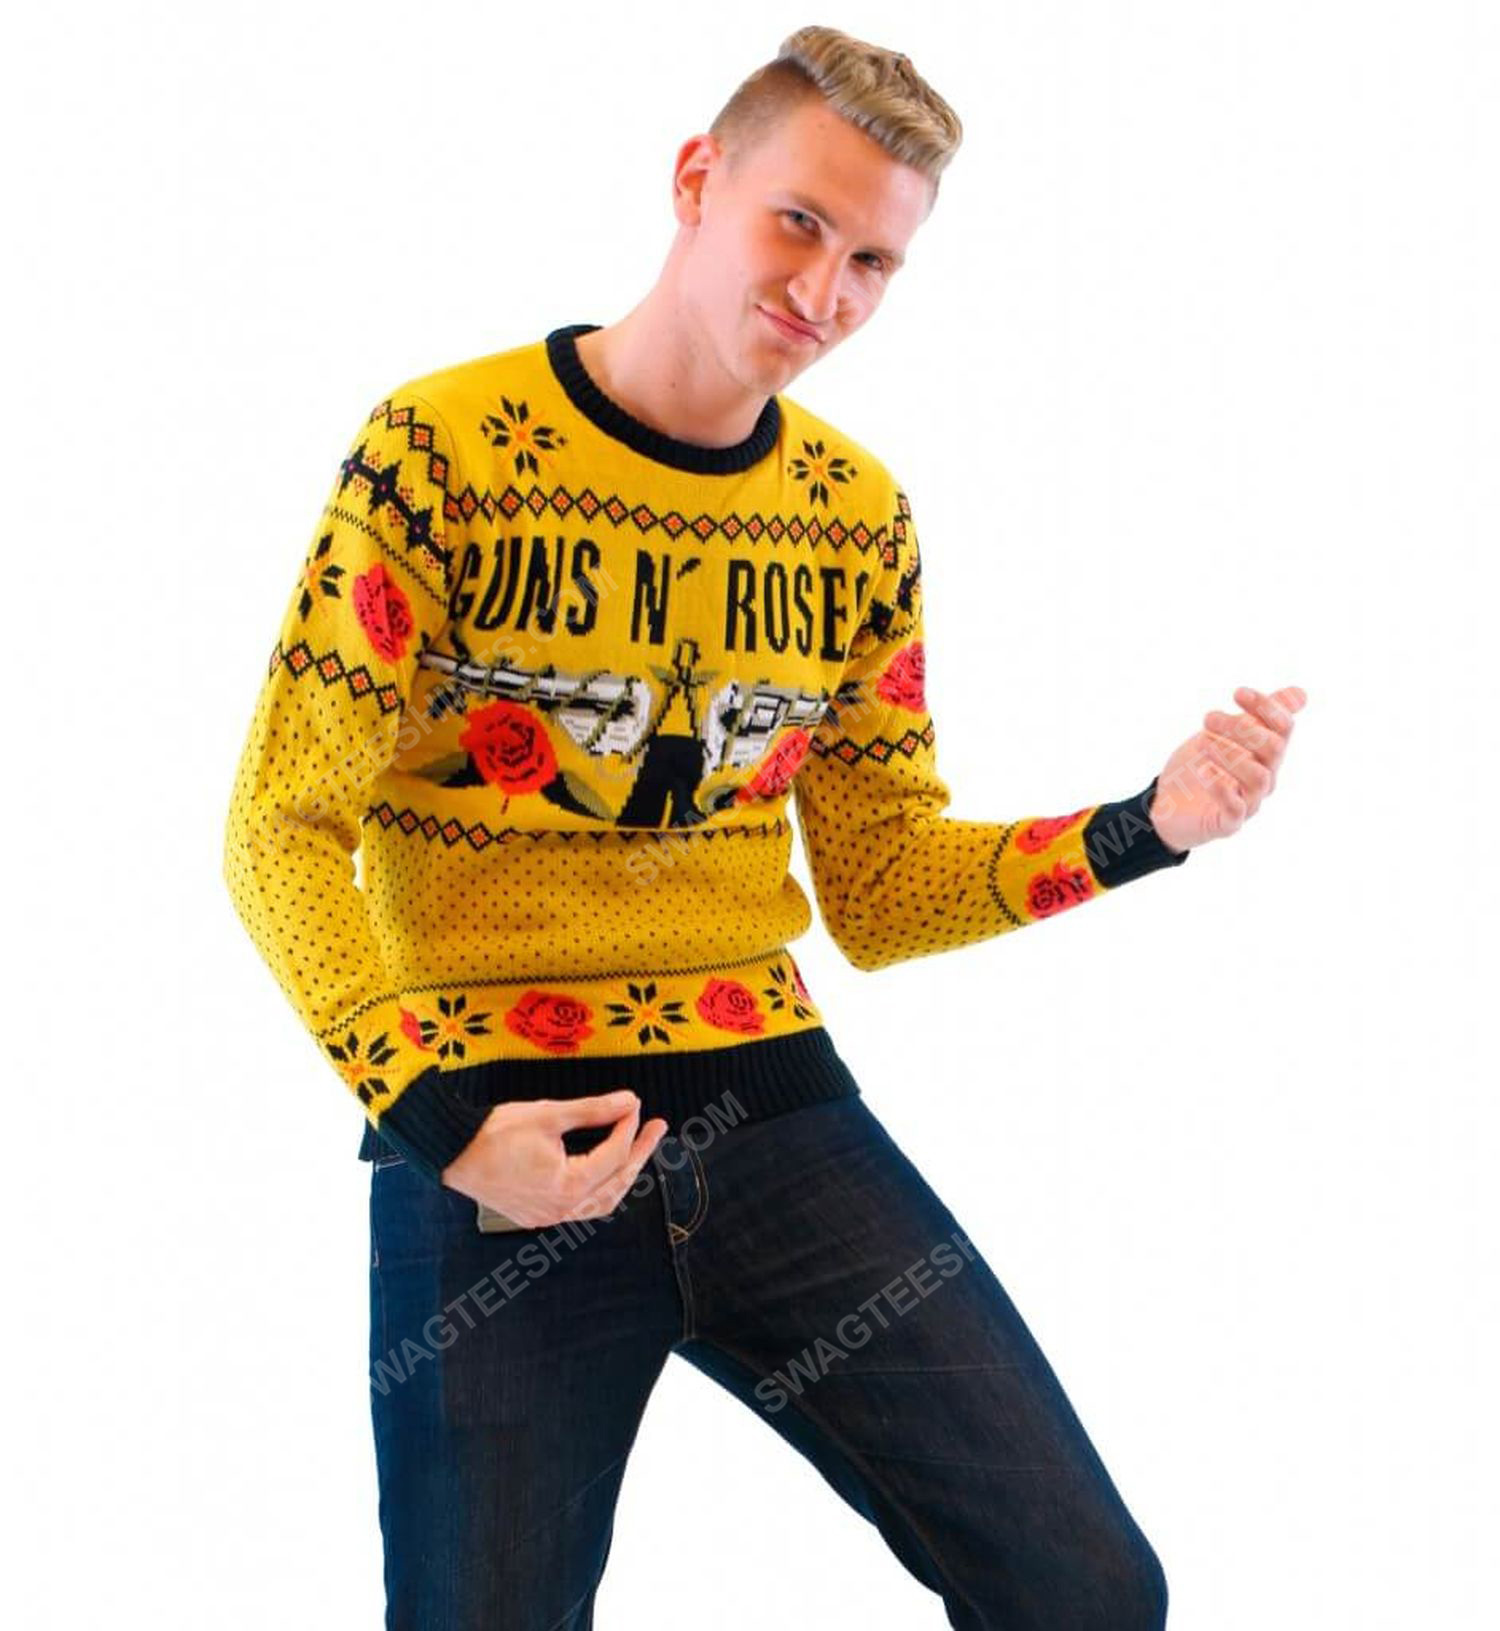 Guns n' roses rock band full print ugly christmas sweater 4